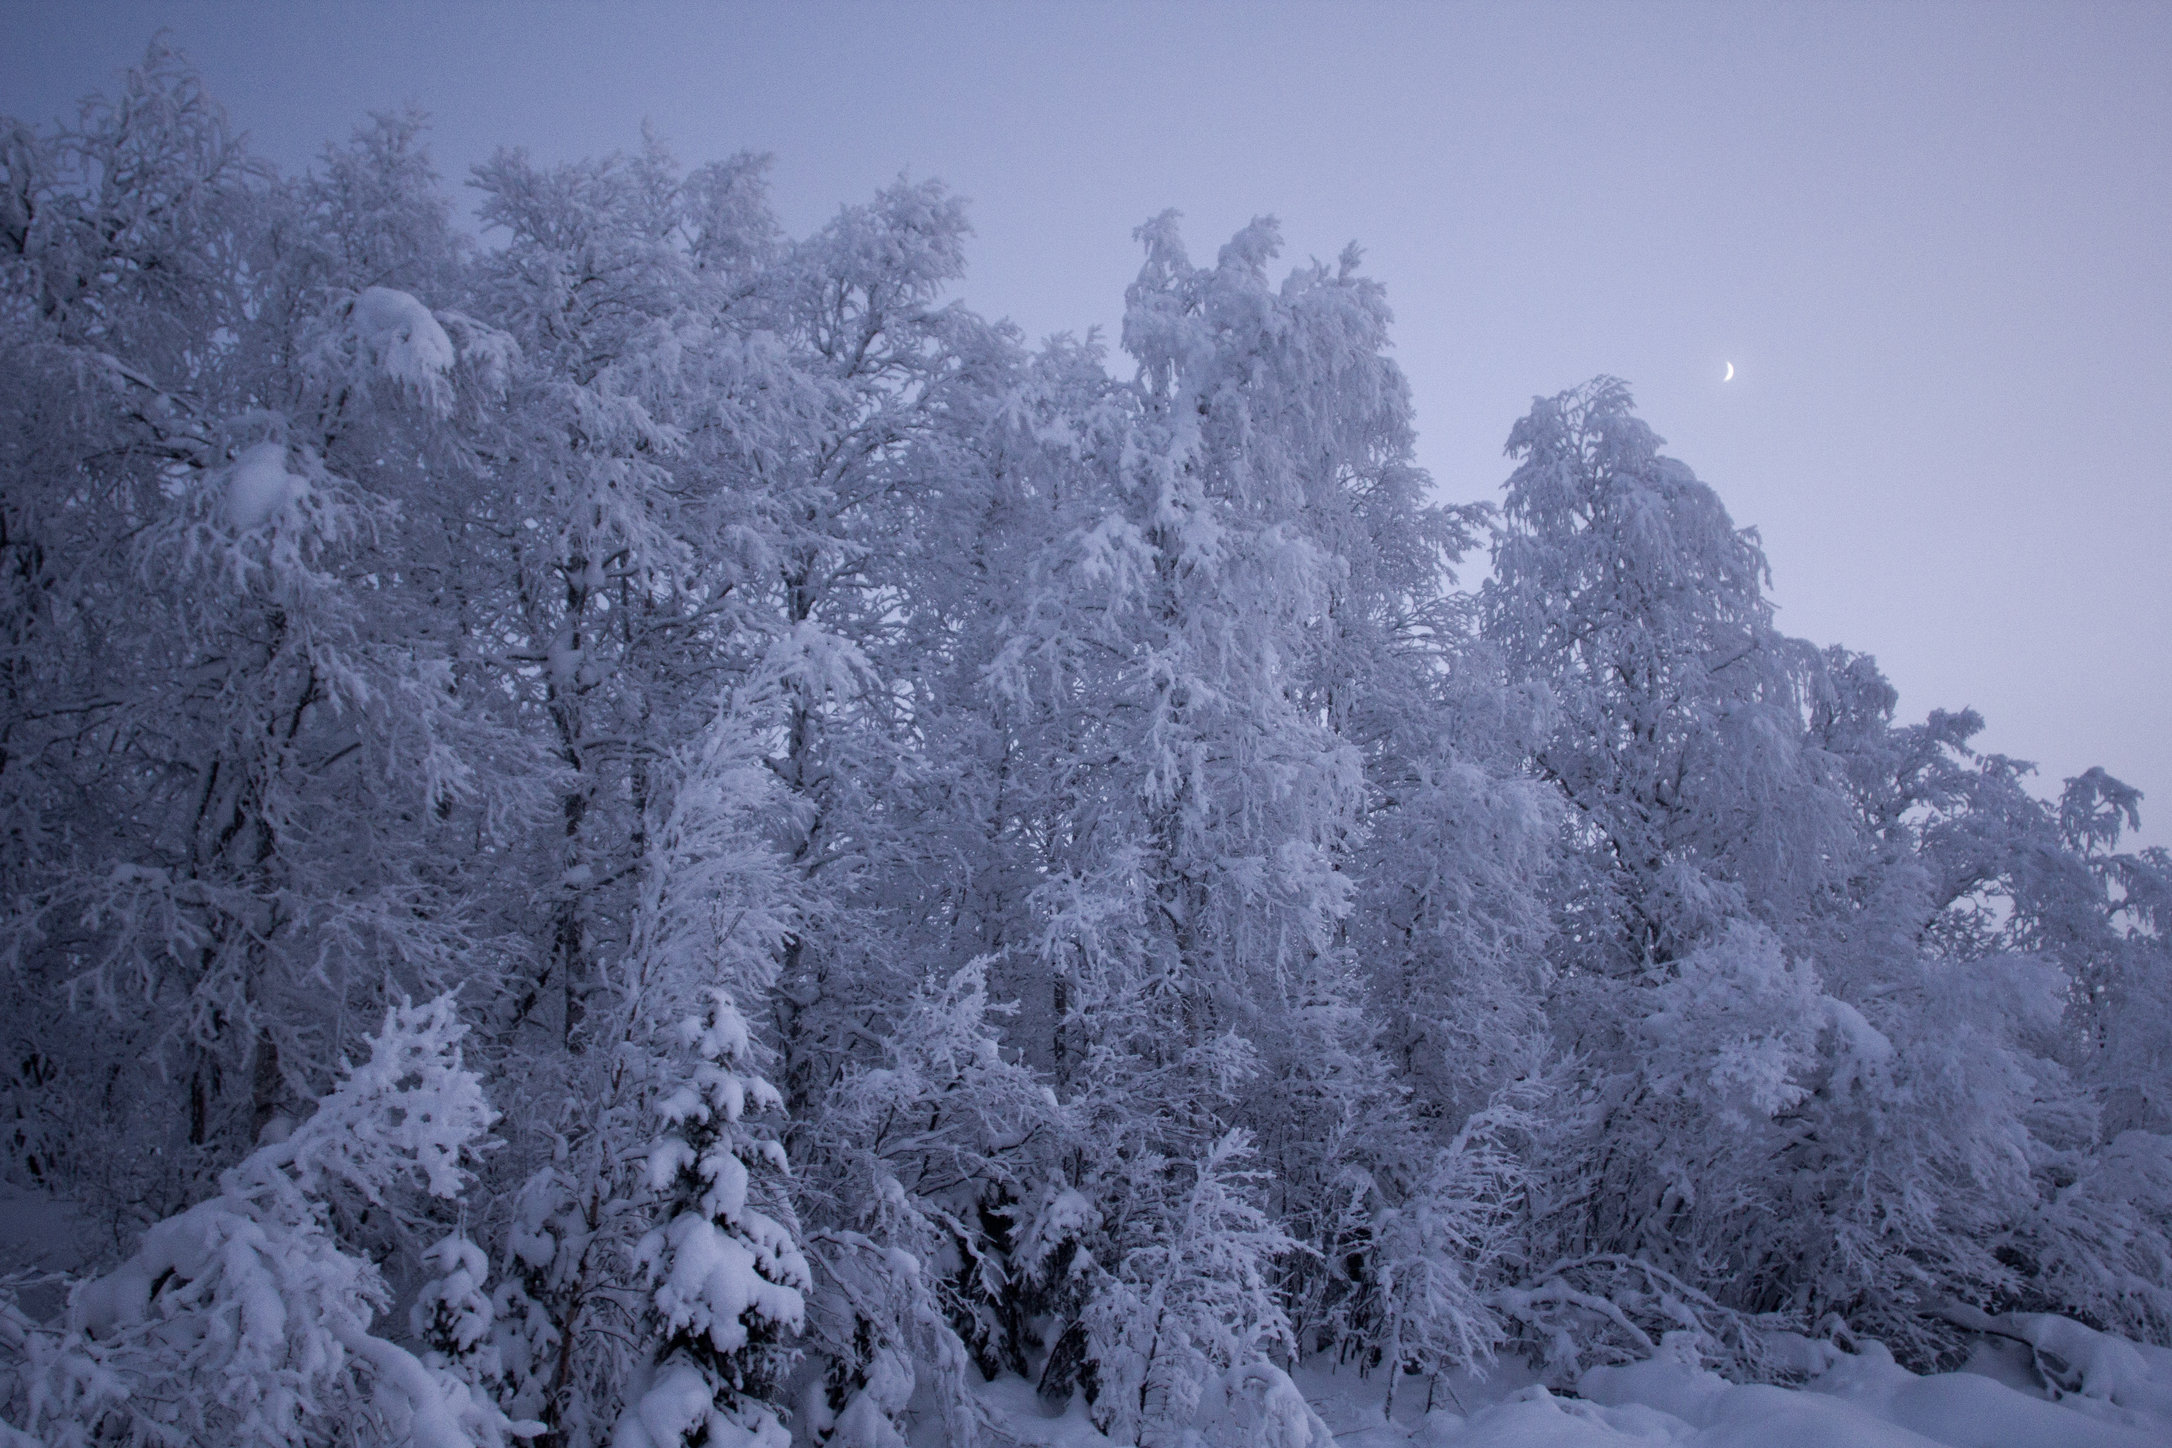 Snow trees_8402804990_o.jpg